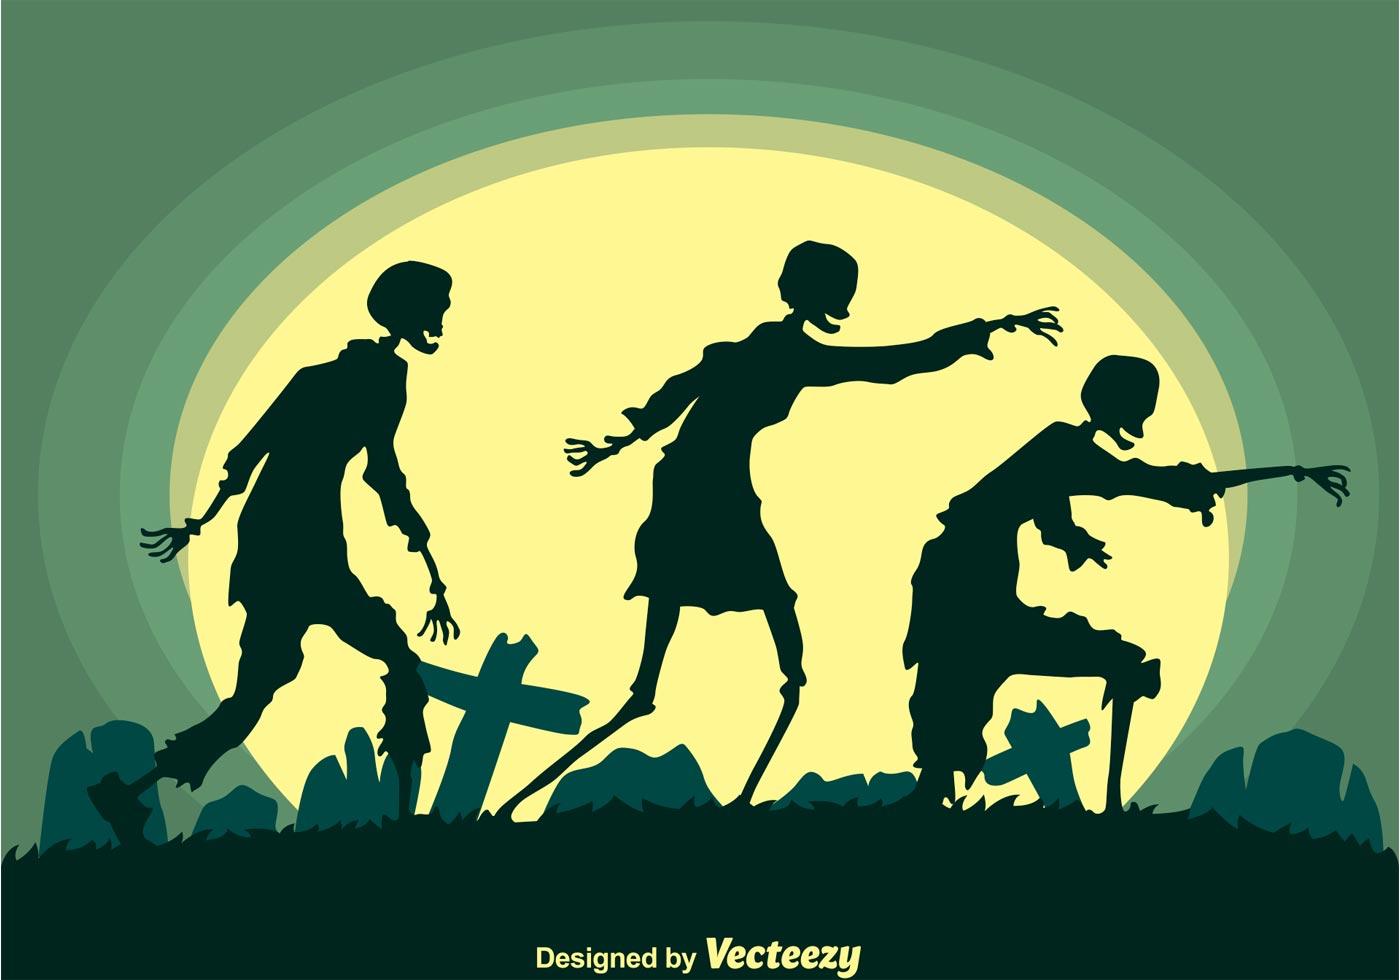 Walking Zombies Silhouette Vector Download Free Vector